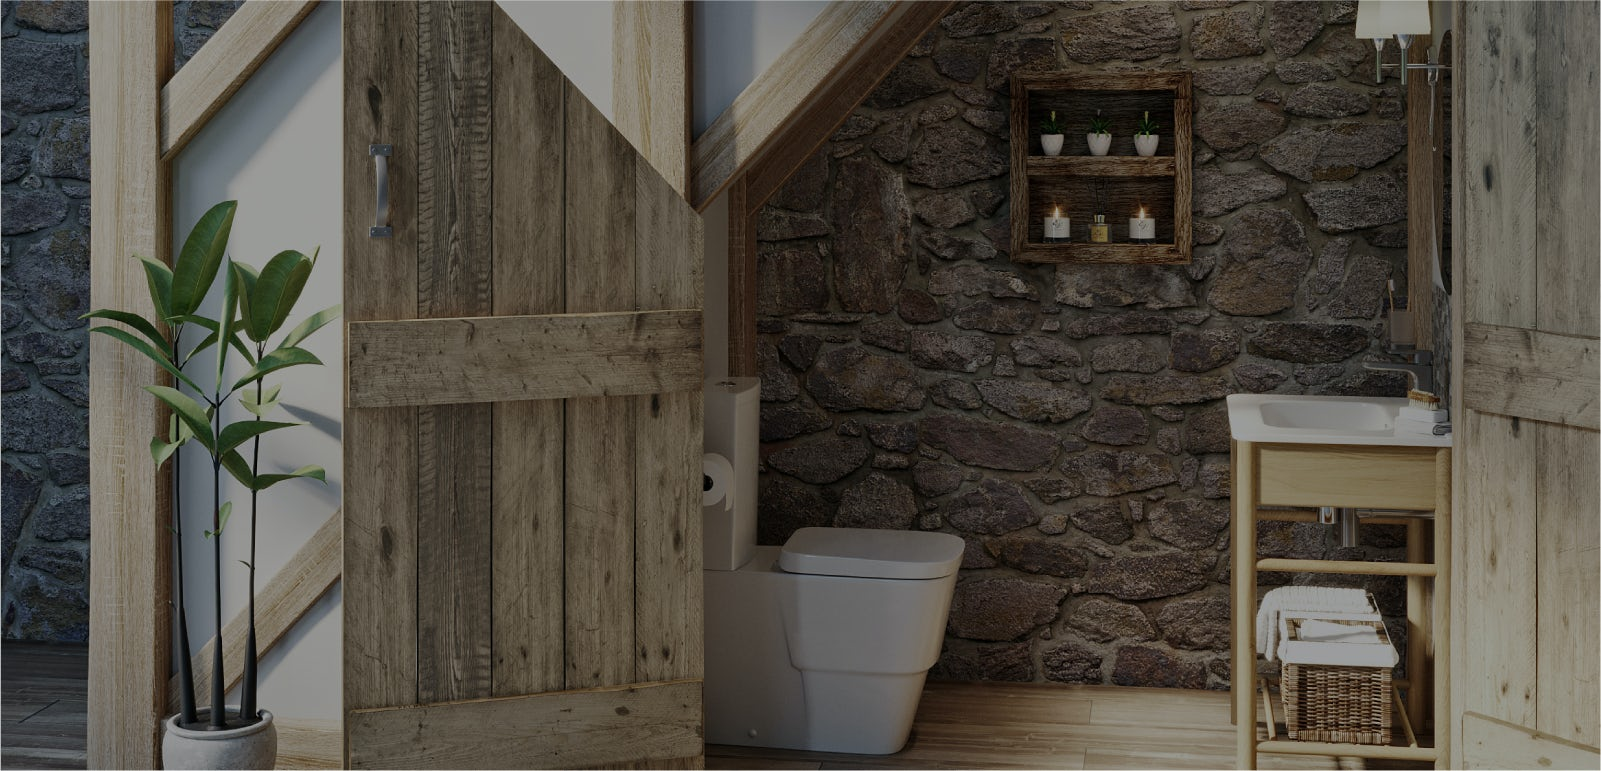 Bathroom ideas: Refined Rustic part 4